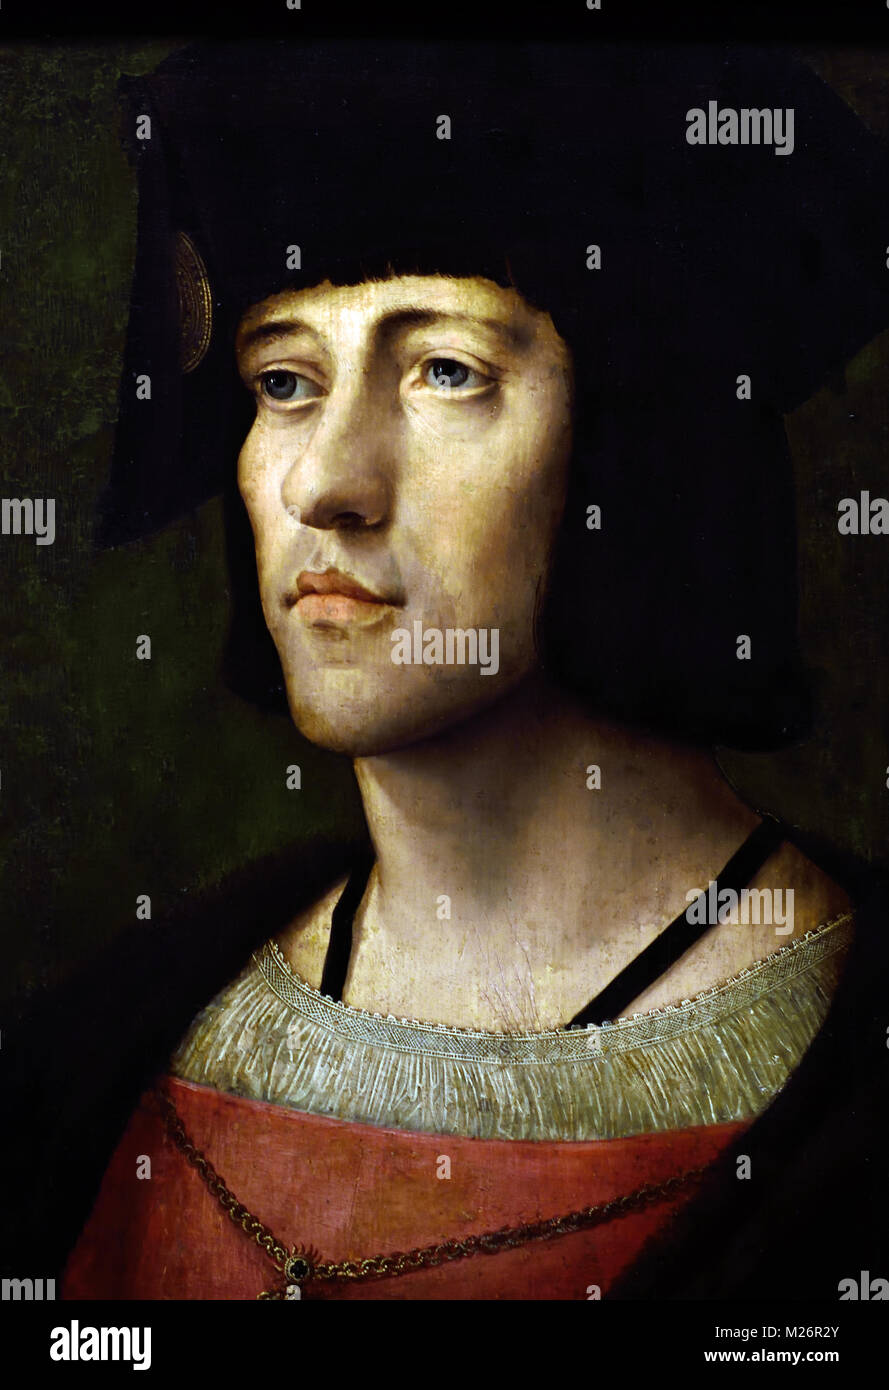 16th Century Flanders Stock Photos & 16th Century Flanders ...